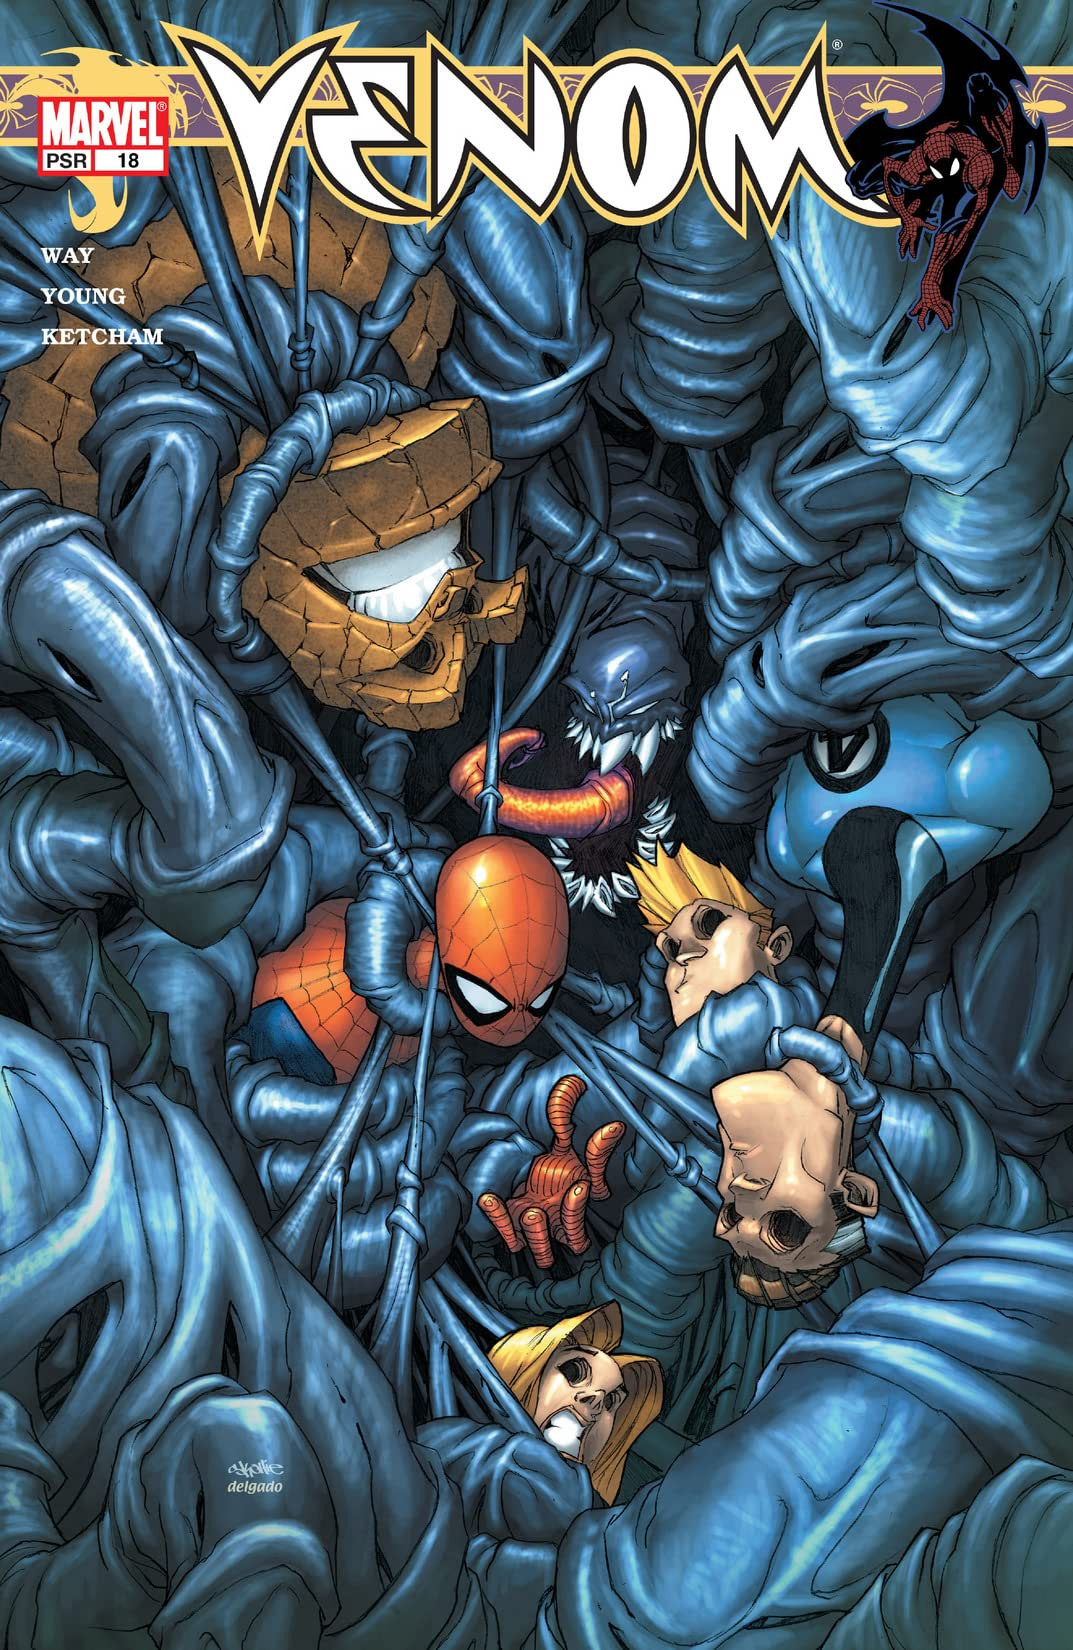 Venom Vol 1 18.jpg